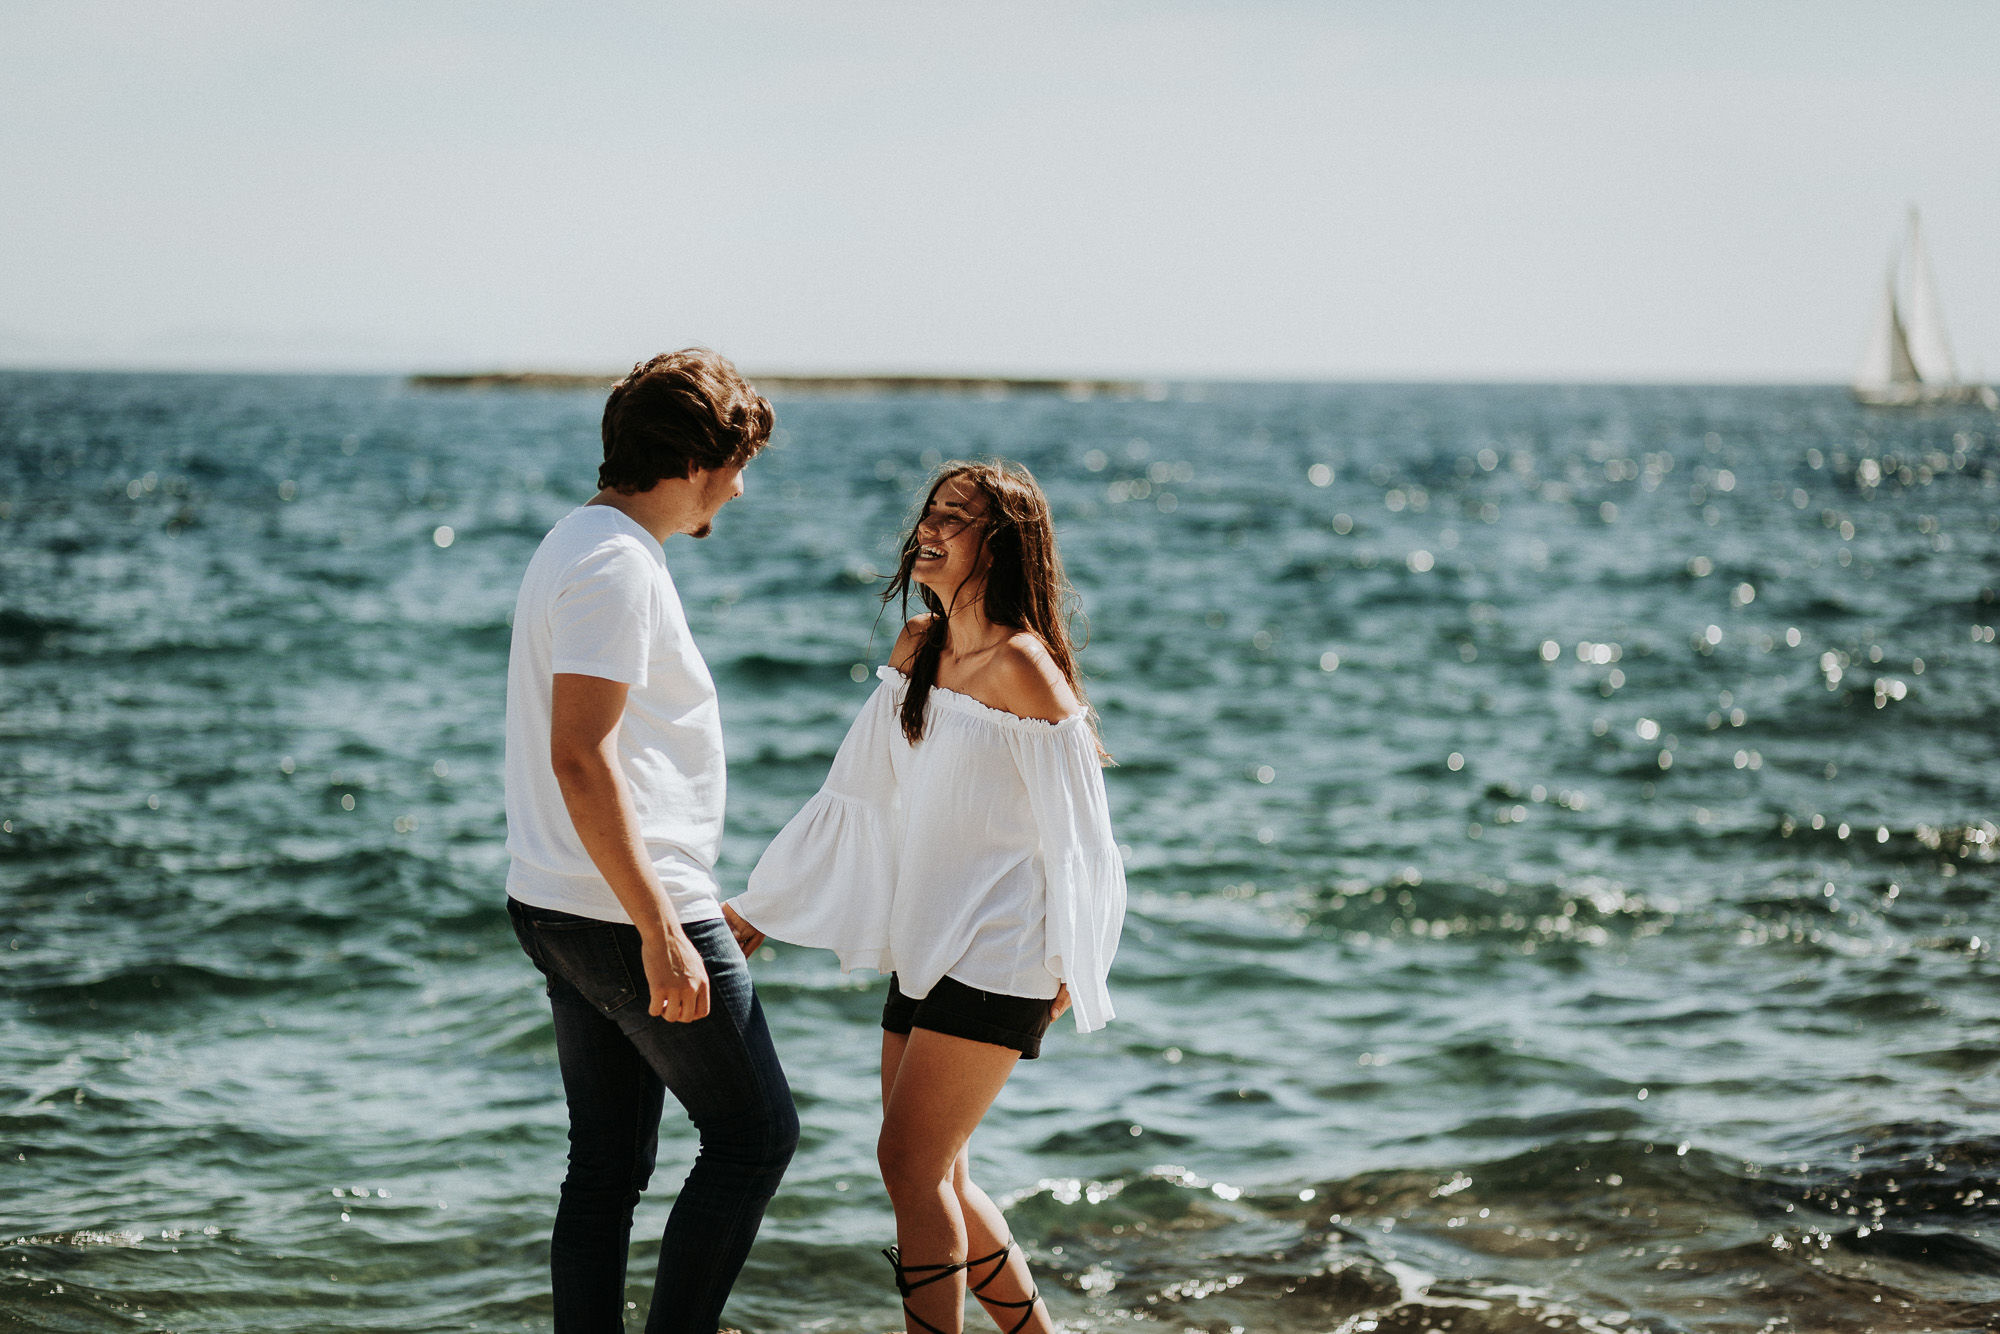 DanielaMarquardtPhotography_wedding_elopement_mallorca_spain_stjordi_sessalines_marinaandxavi171